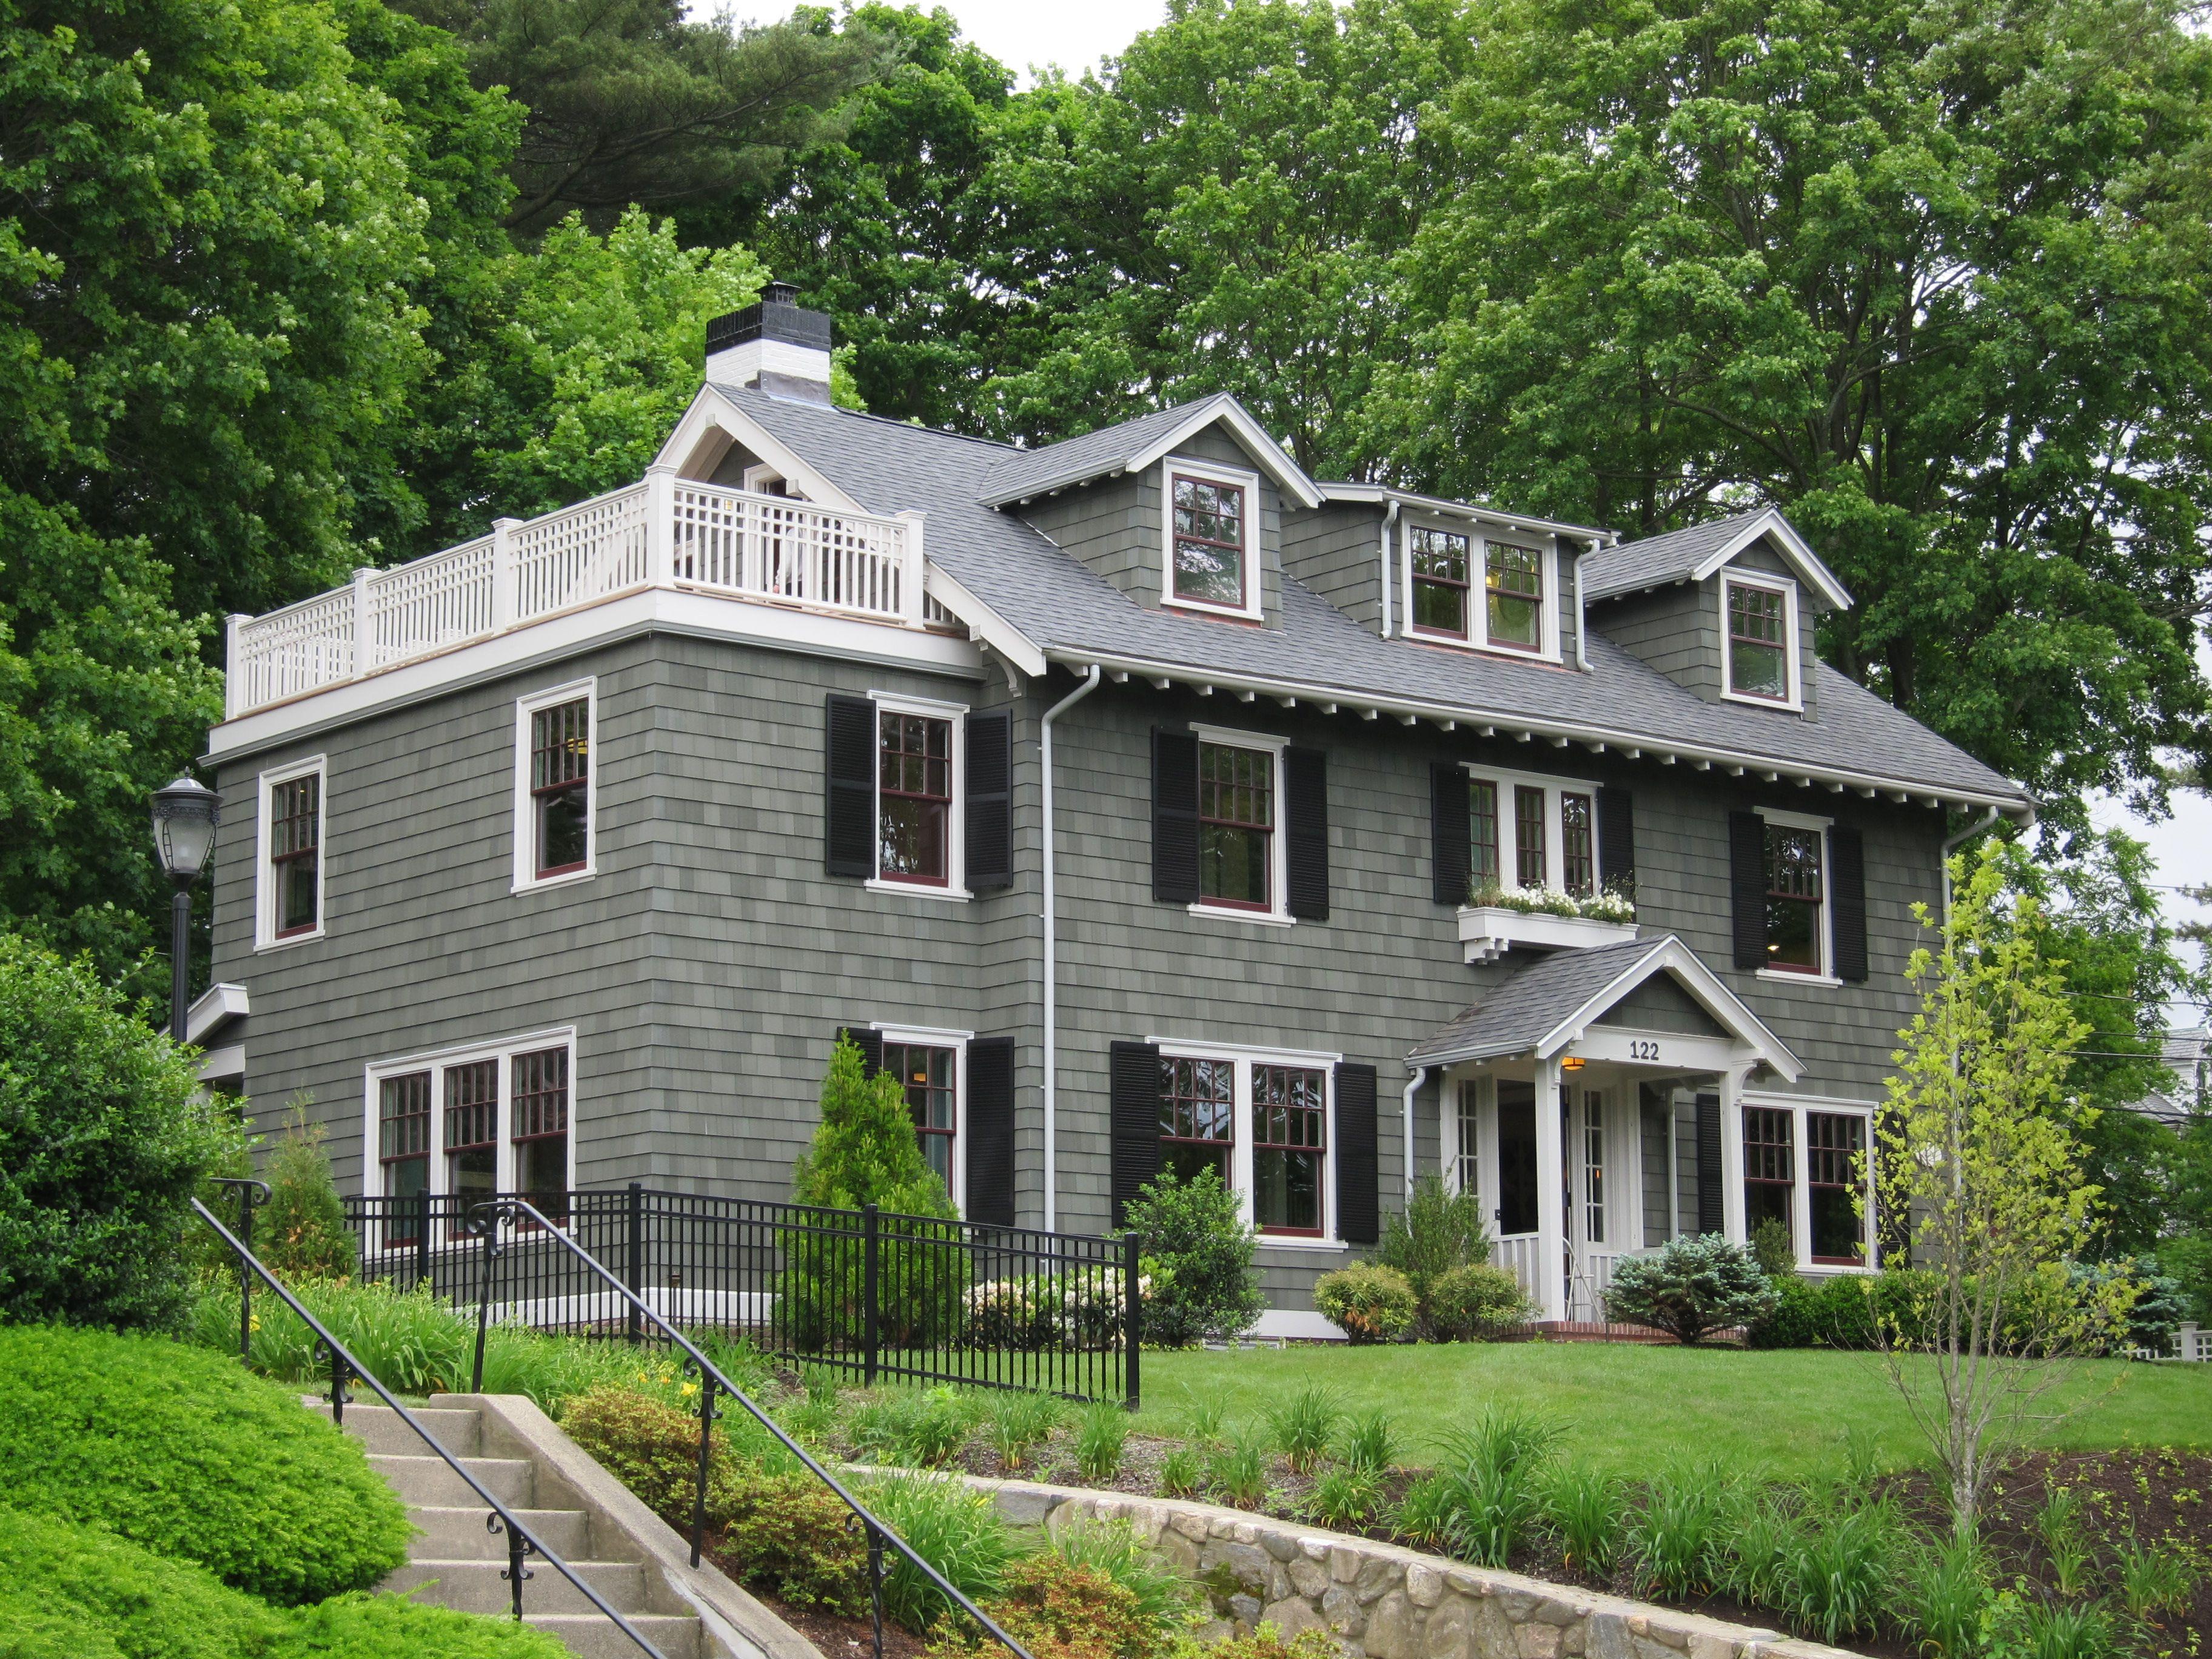 Colori Per Esterni Di Case : House colors green with black shutters renovations pinterest